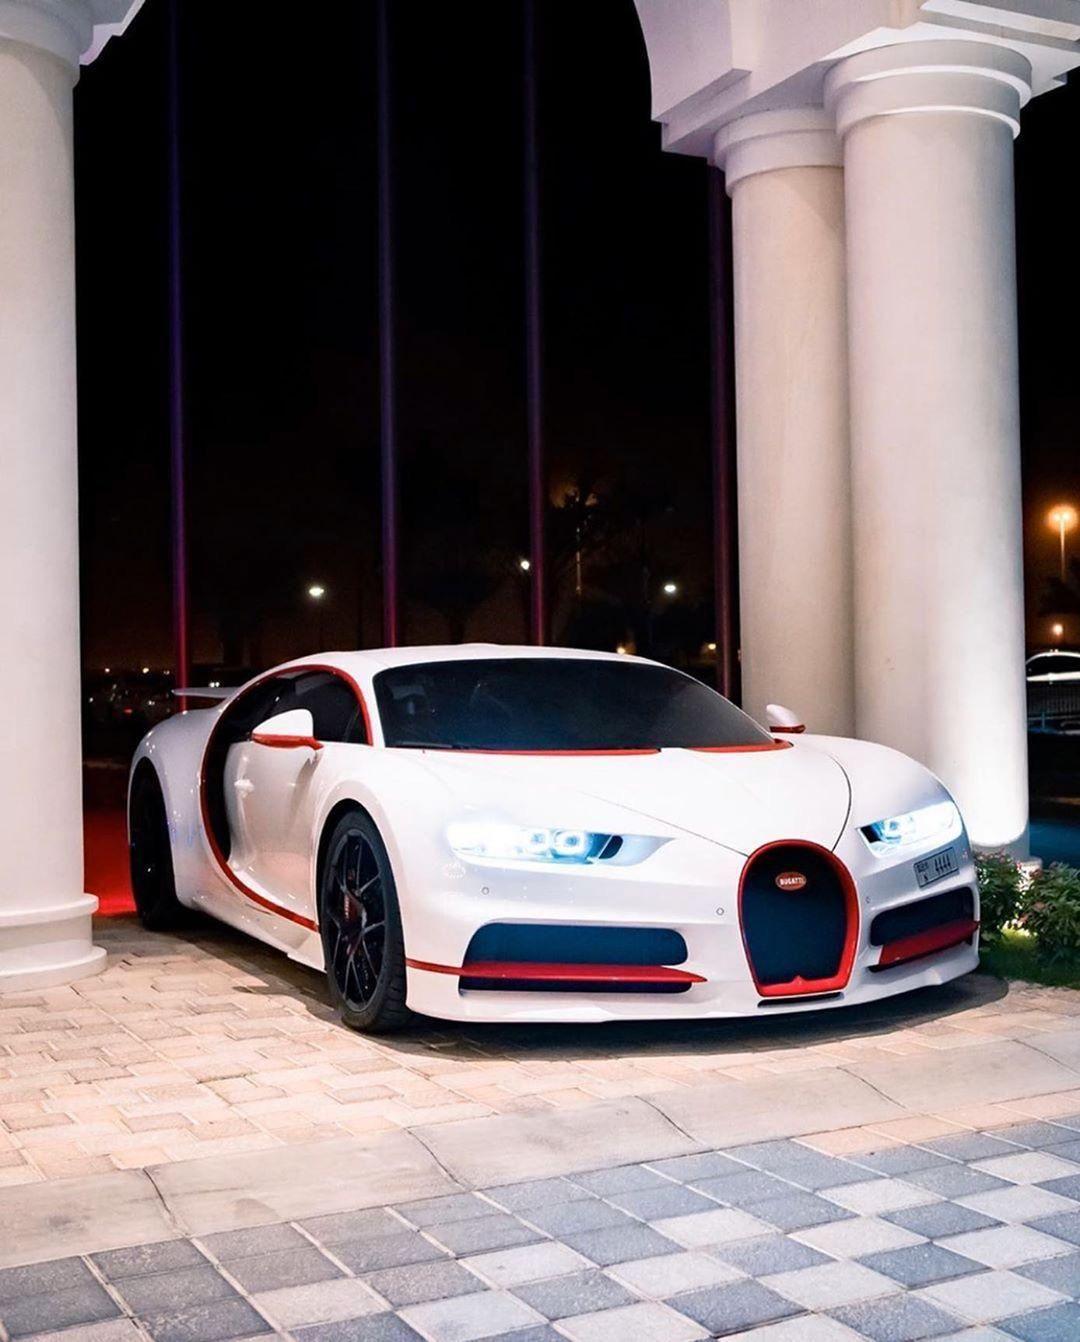 Top Vehicles C63 Amg Black Series Via Reddit In 2020 Super Luxury Cars Bugatti Cars Best Luxury Cars